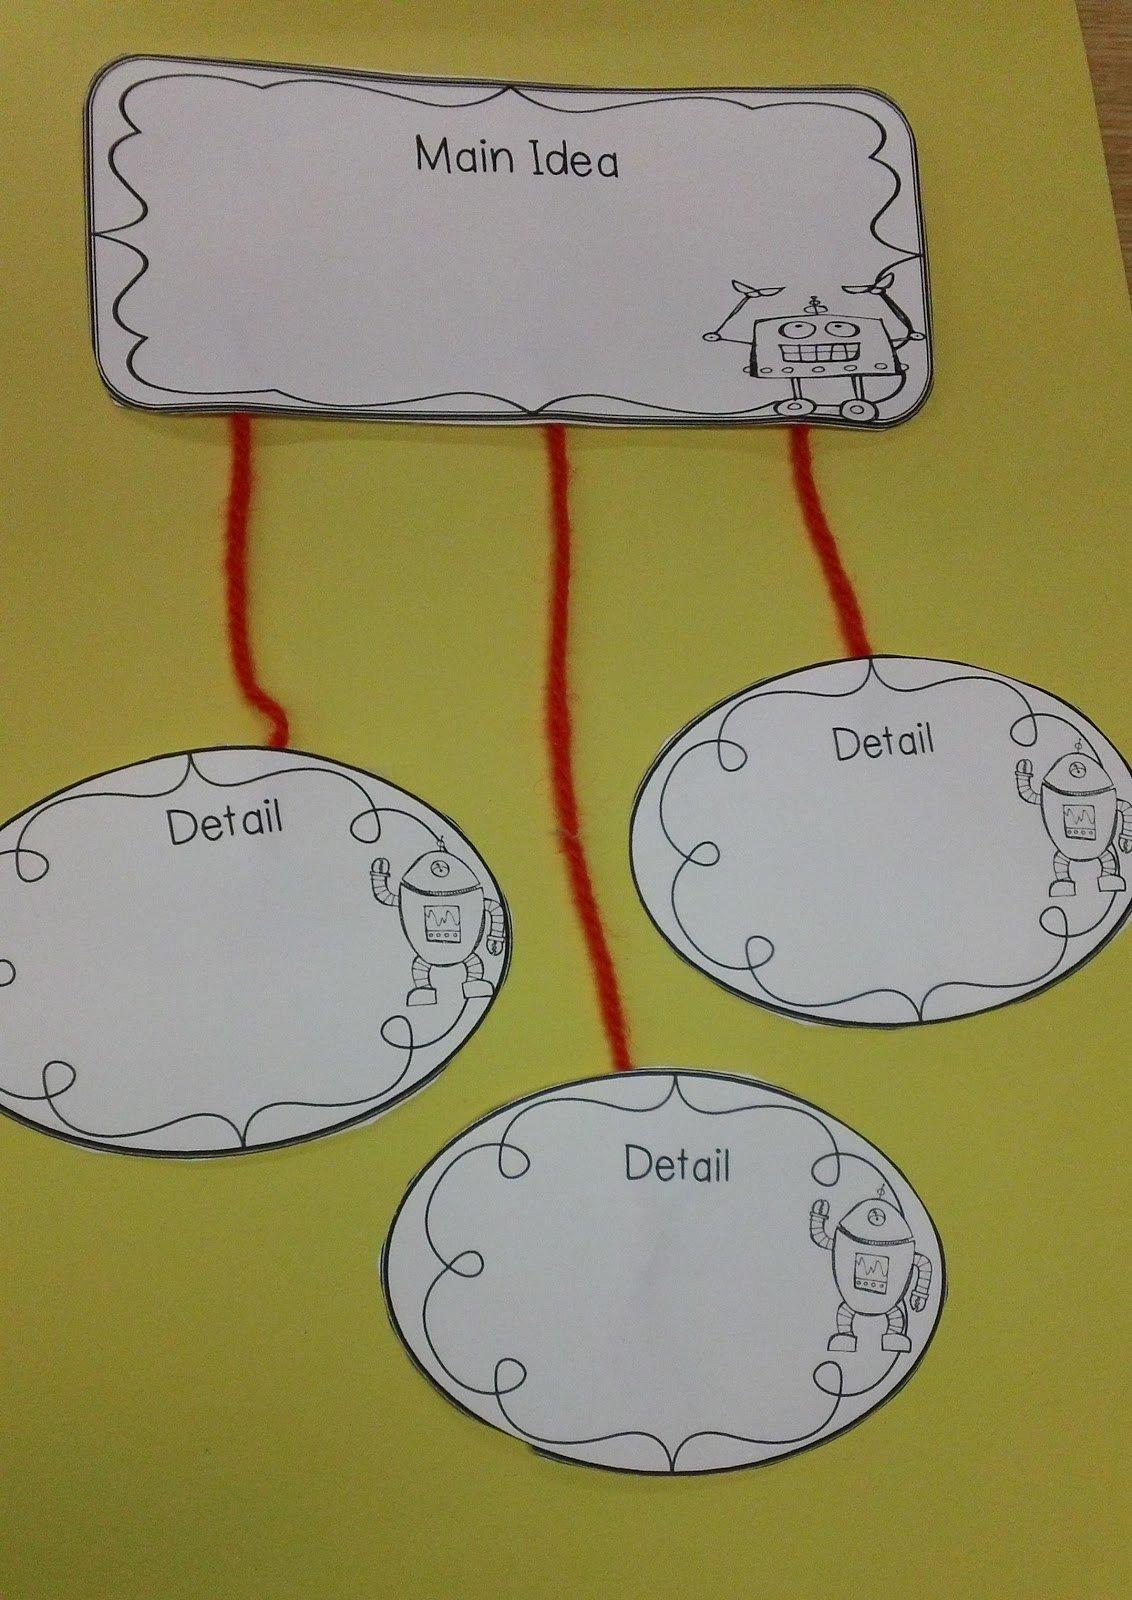 10 Ideal Main Idea Powerpoint 4Th Grade stellar students main idea